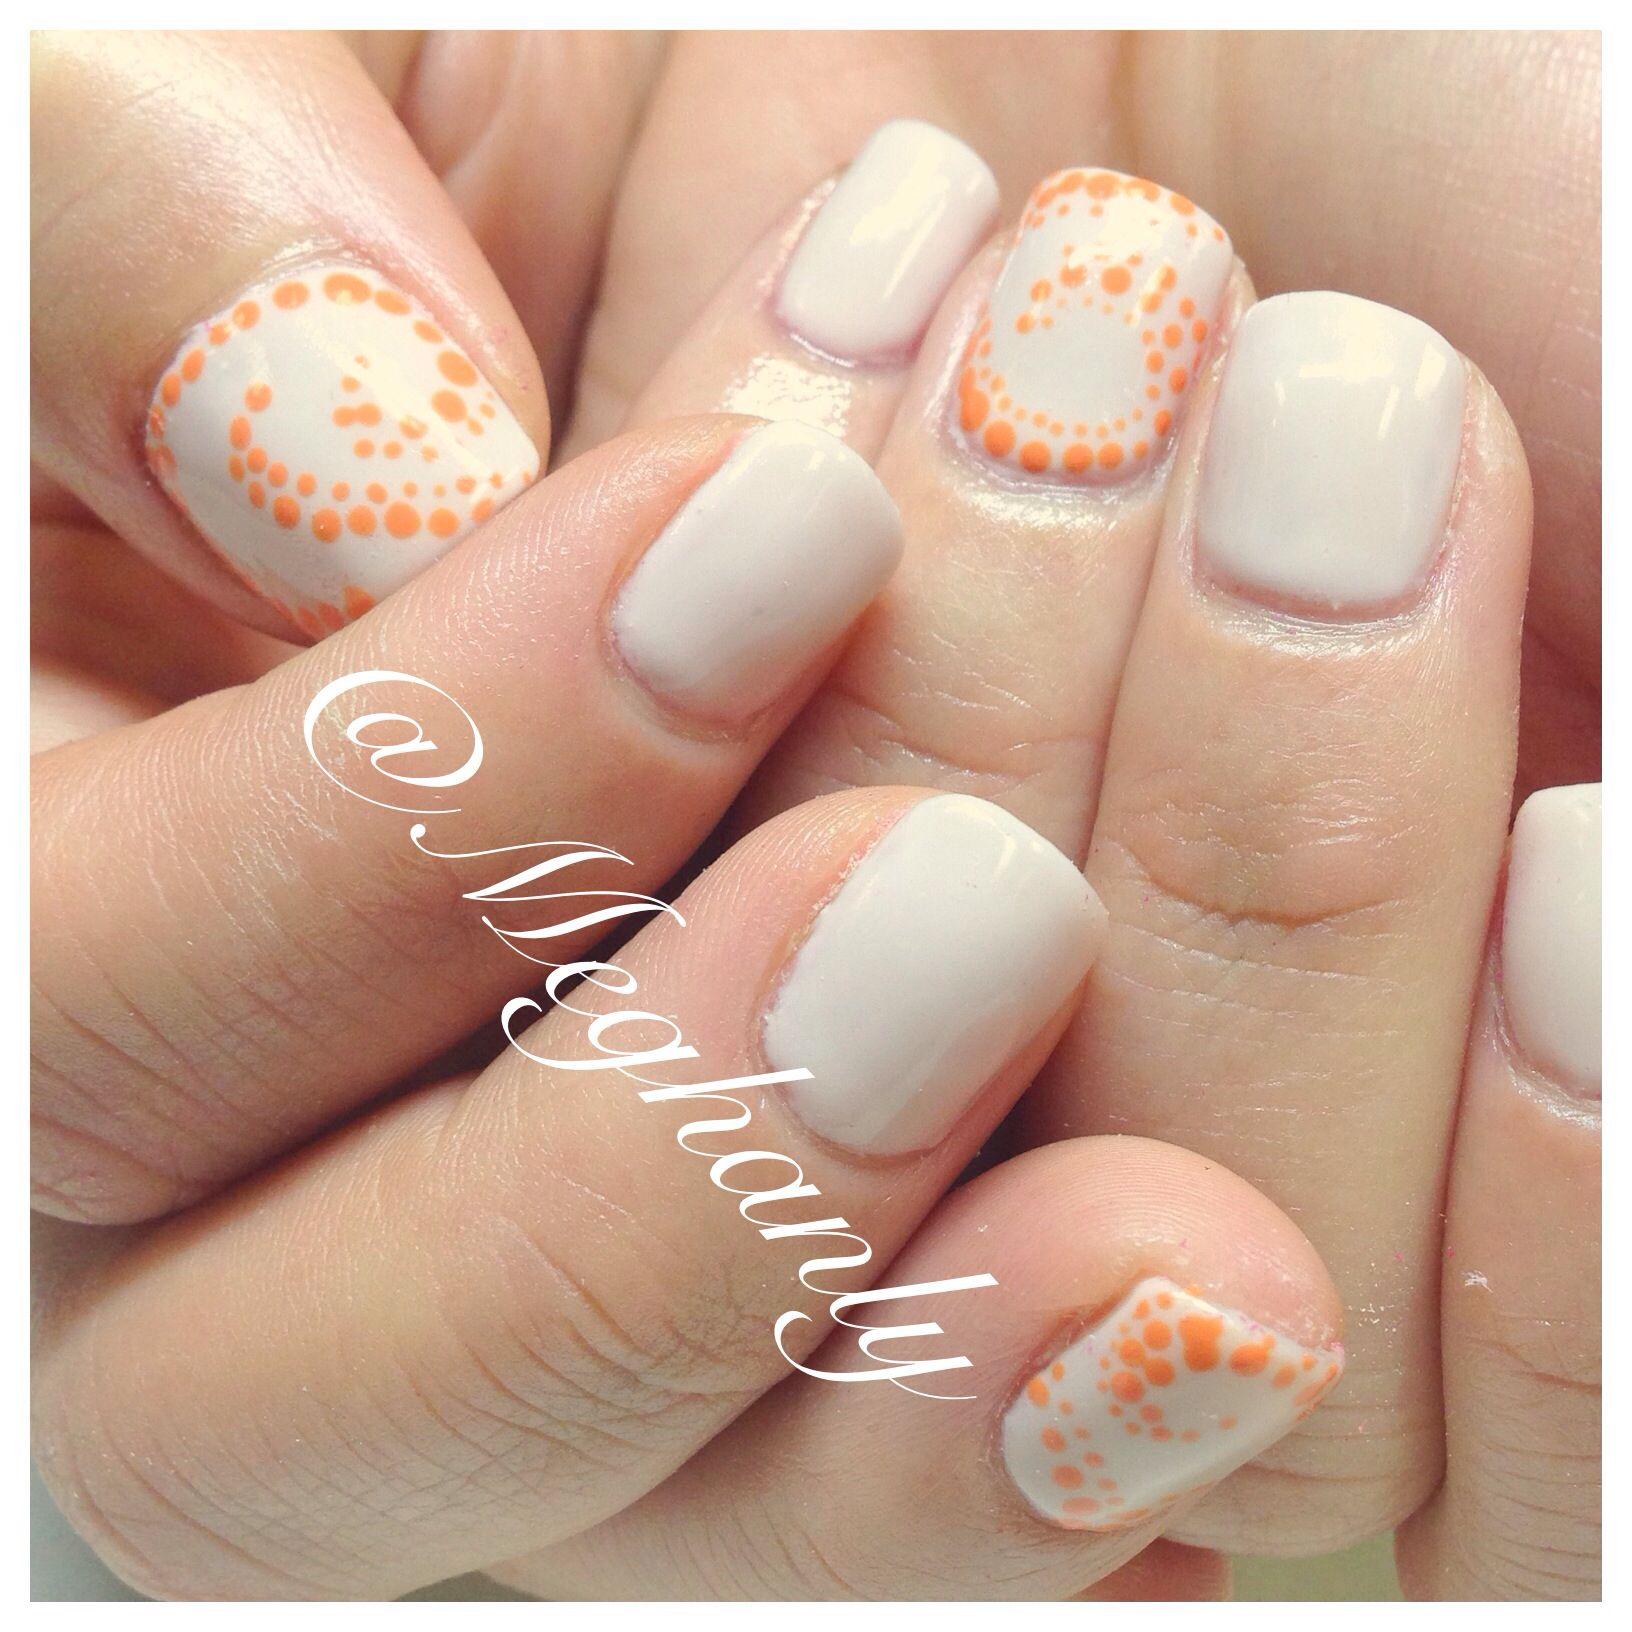 Swirly nail art. Swirl nails. Orange. Cream. Summer nails. Spring nails.